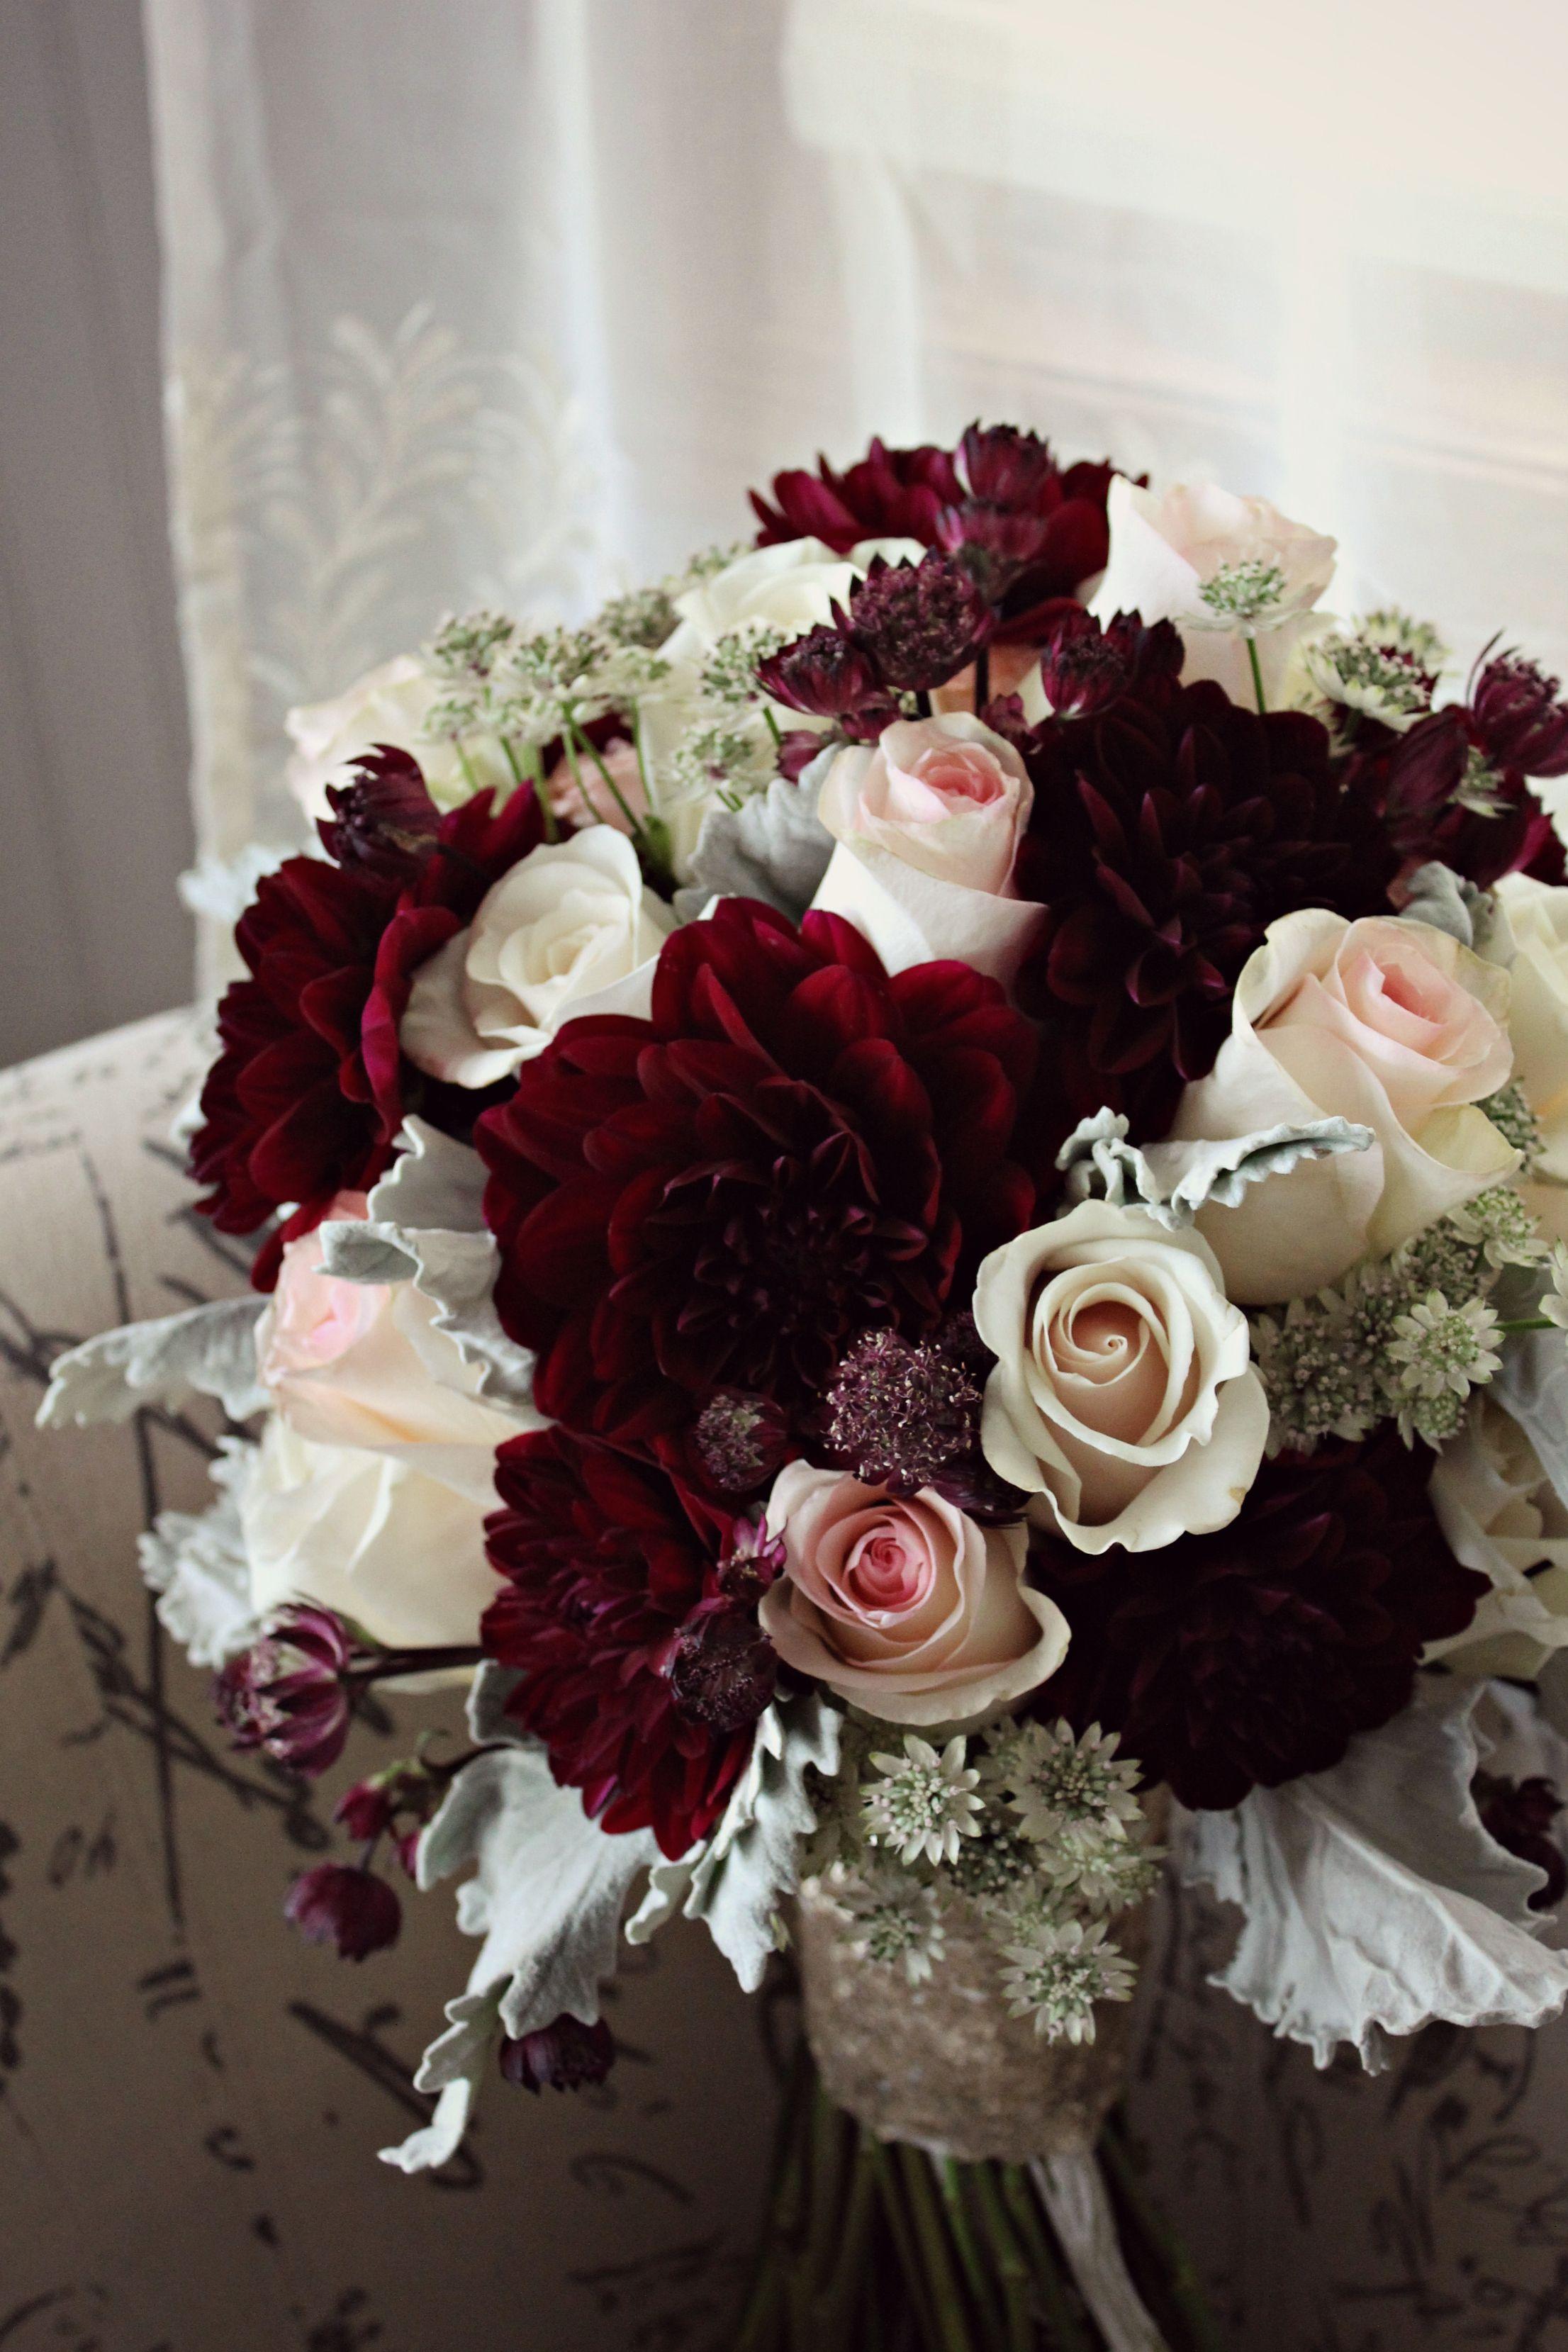 Stunning Burgundy Blush And Champagne Wedding Bouquet